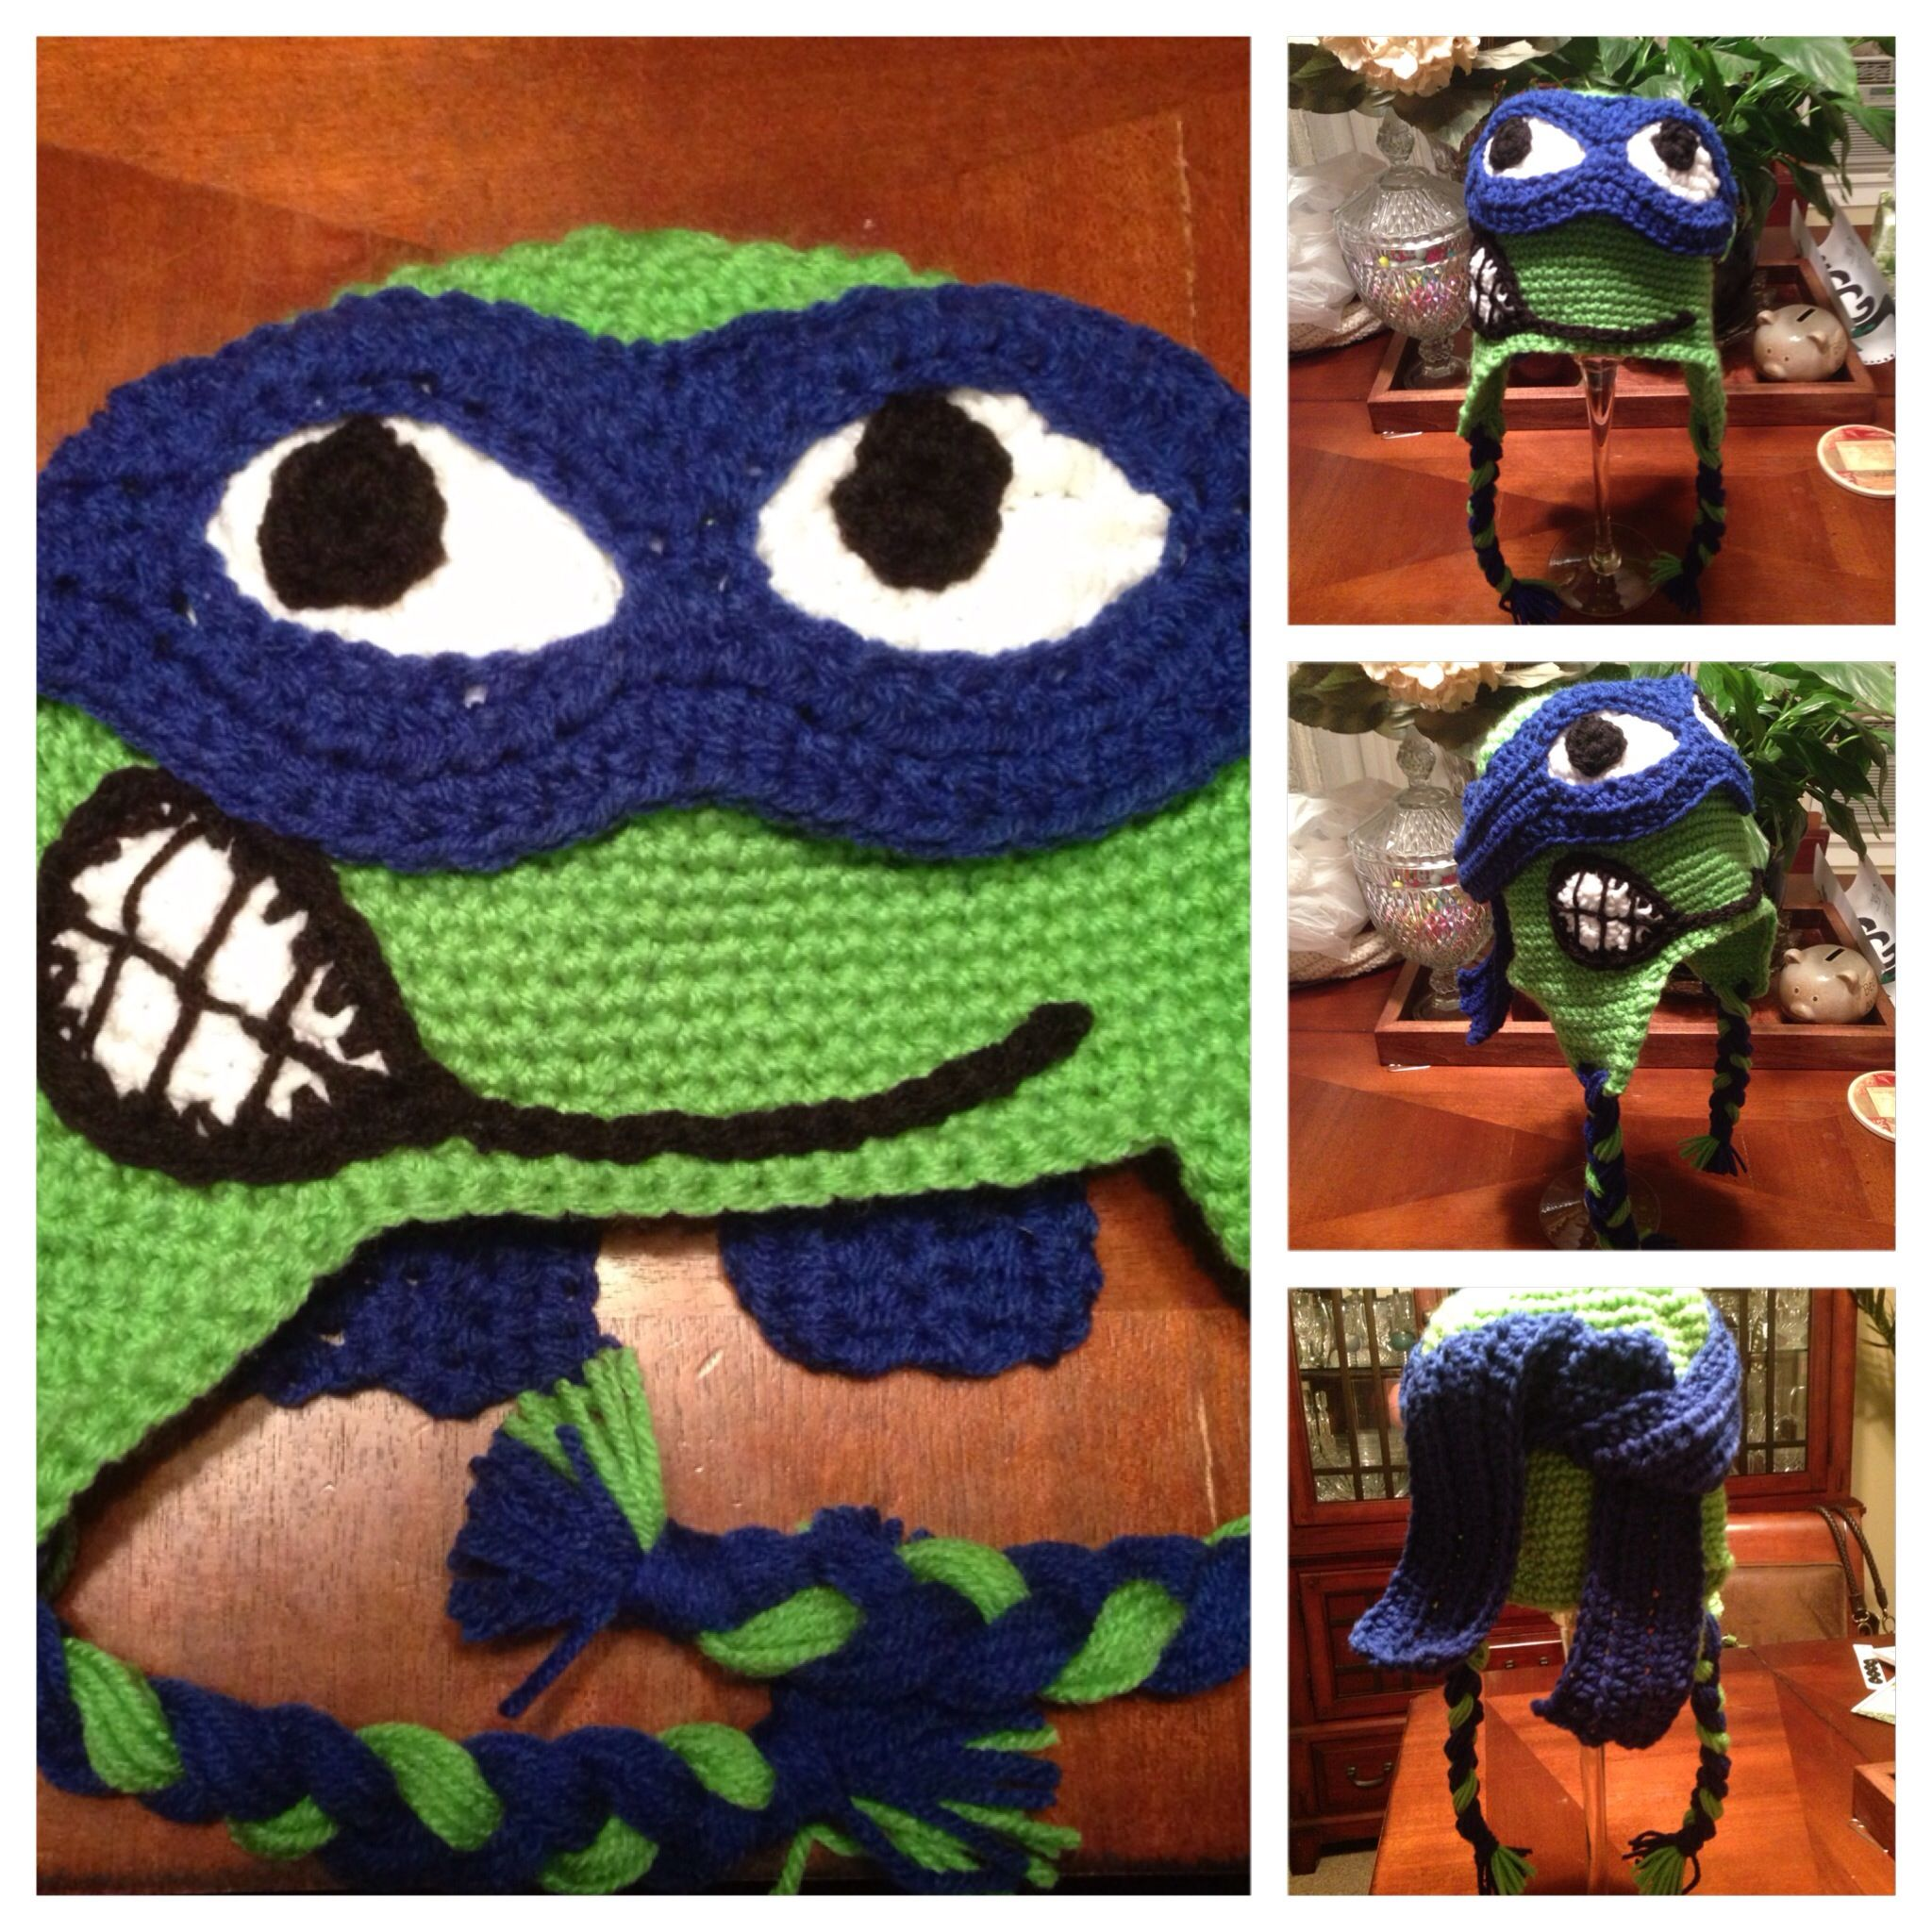 Crochet Ninja Turtle : Crochet Ninja Turtles hat!! crochet Pinterest